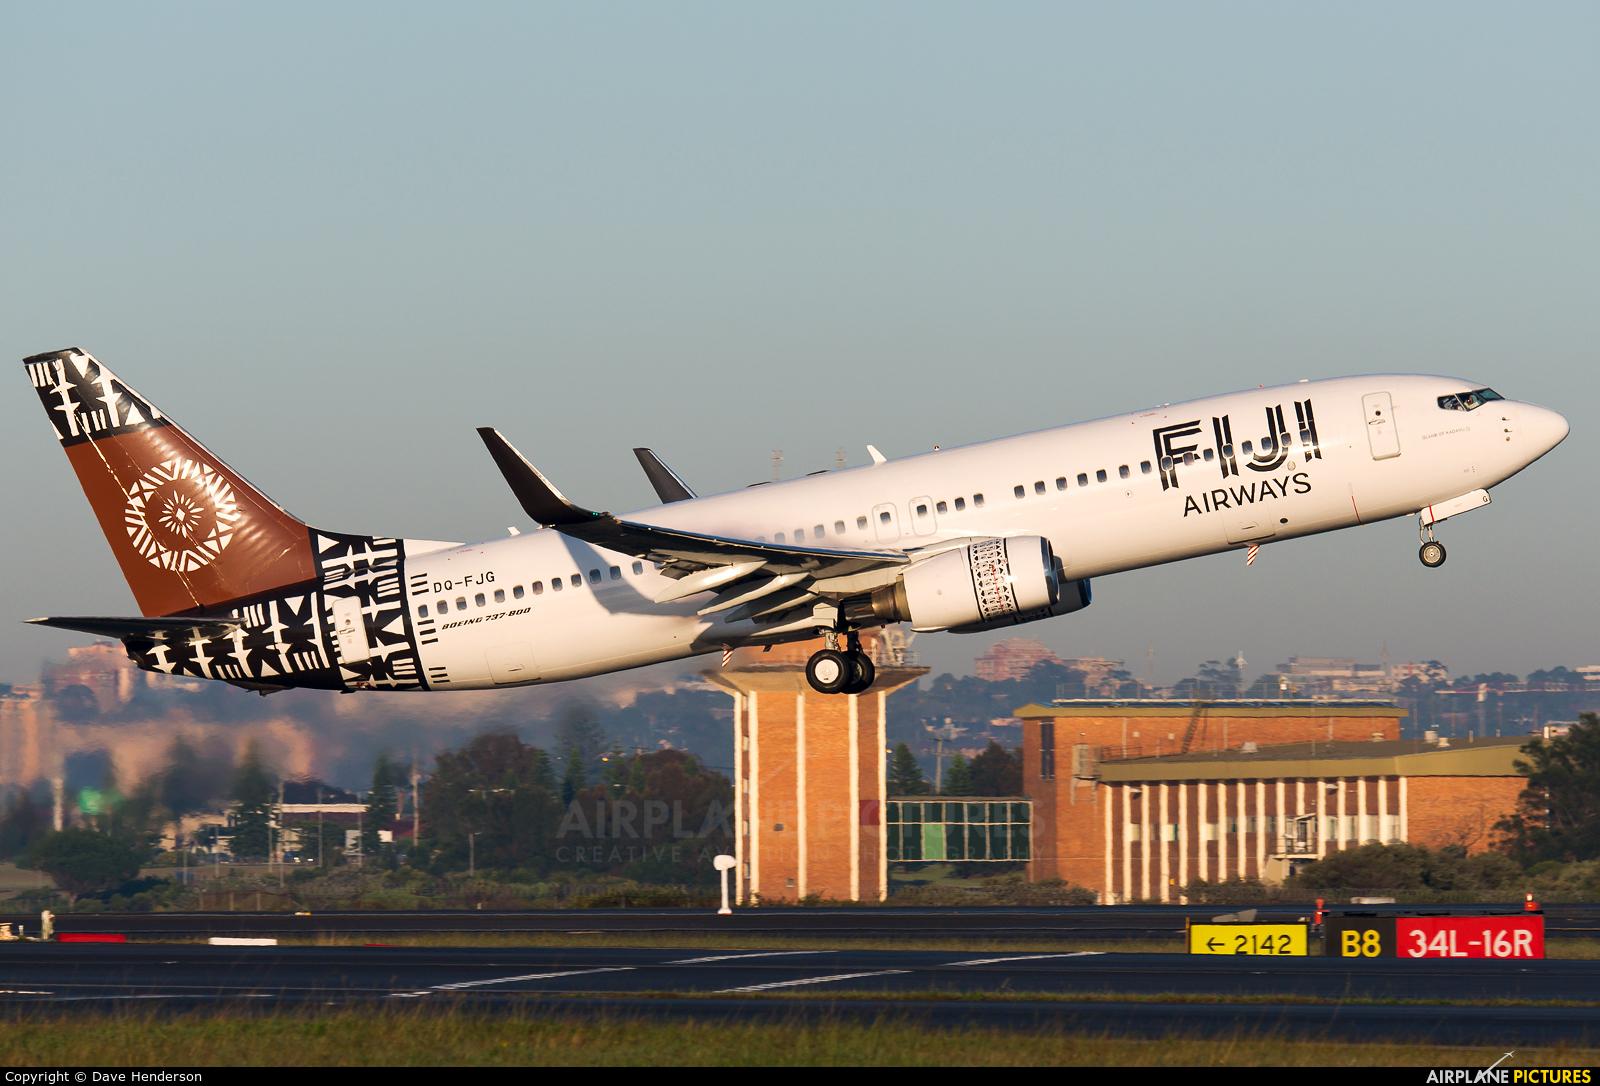 Fiji Airways DQ-FJG aircraft at Sydney - Kingsford Smith Intl, NSW